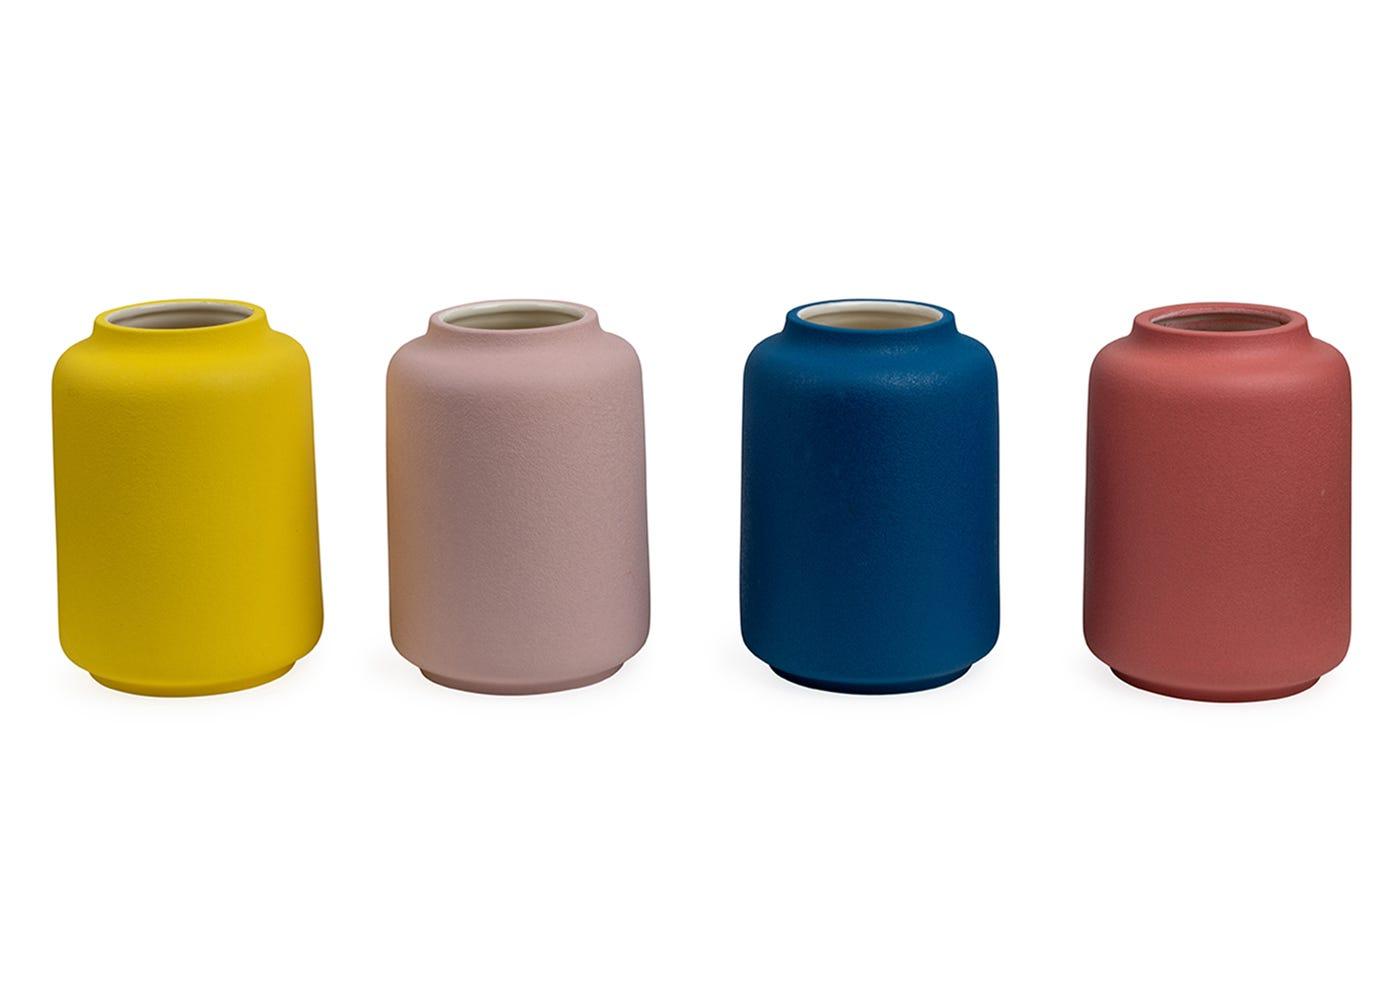 Small trent vases